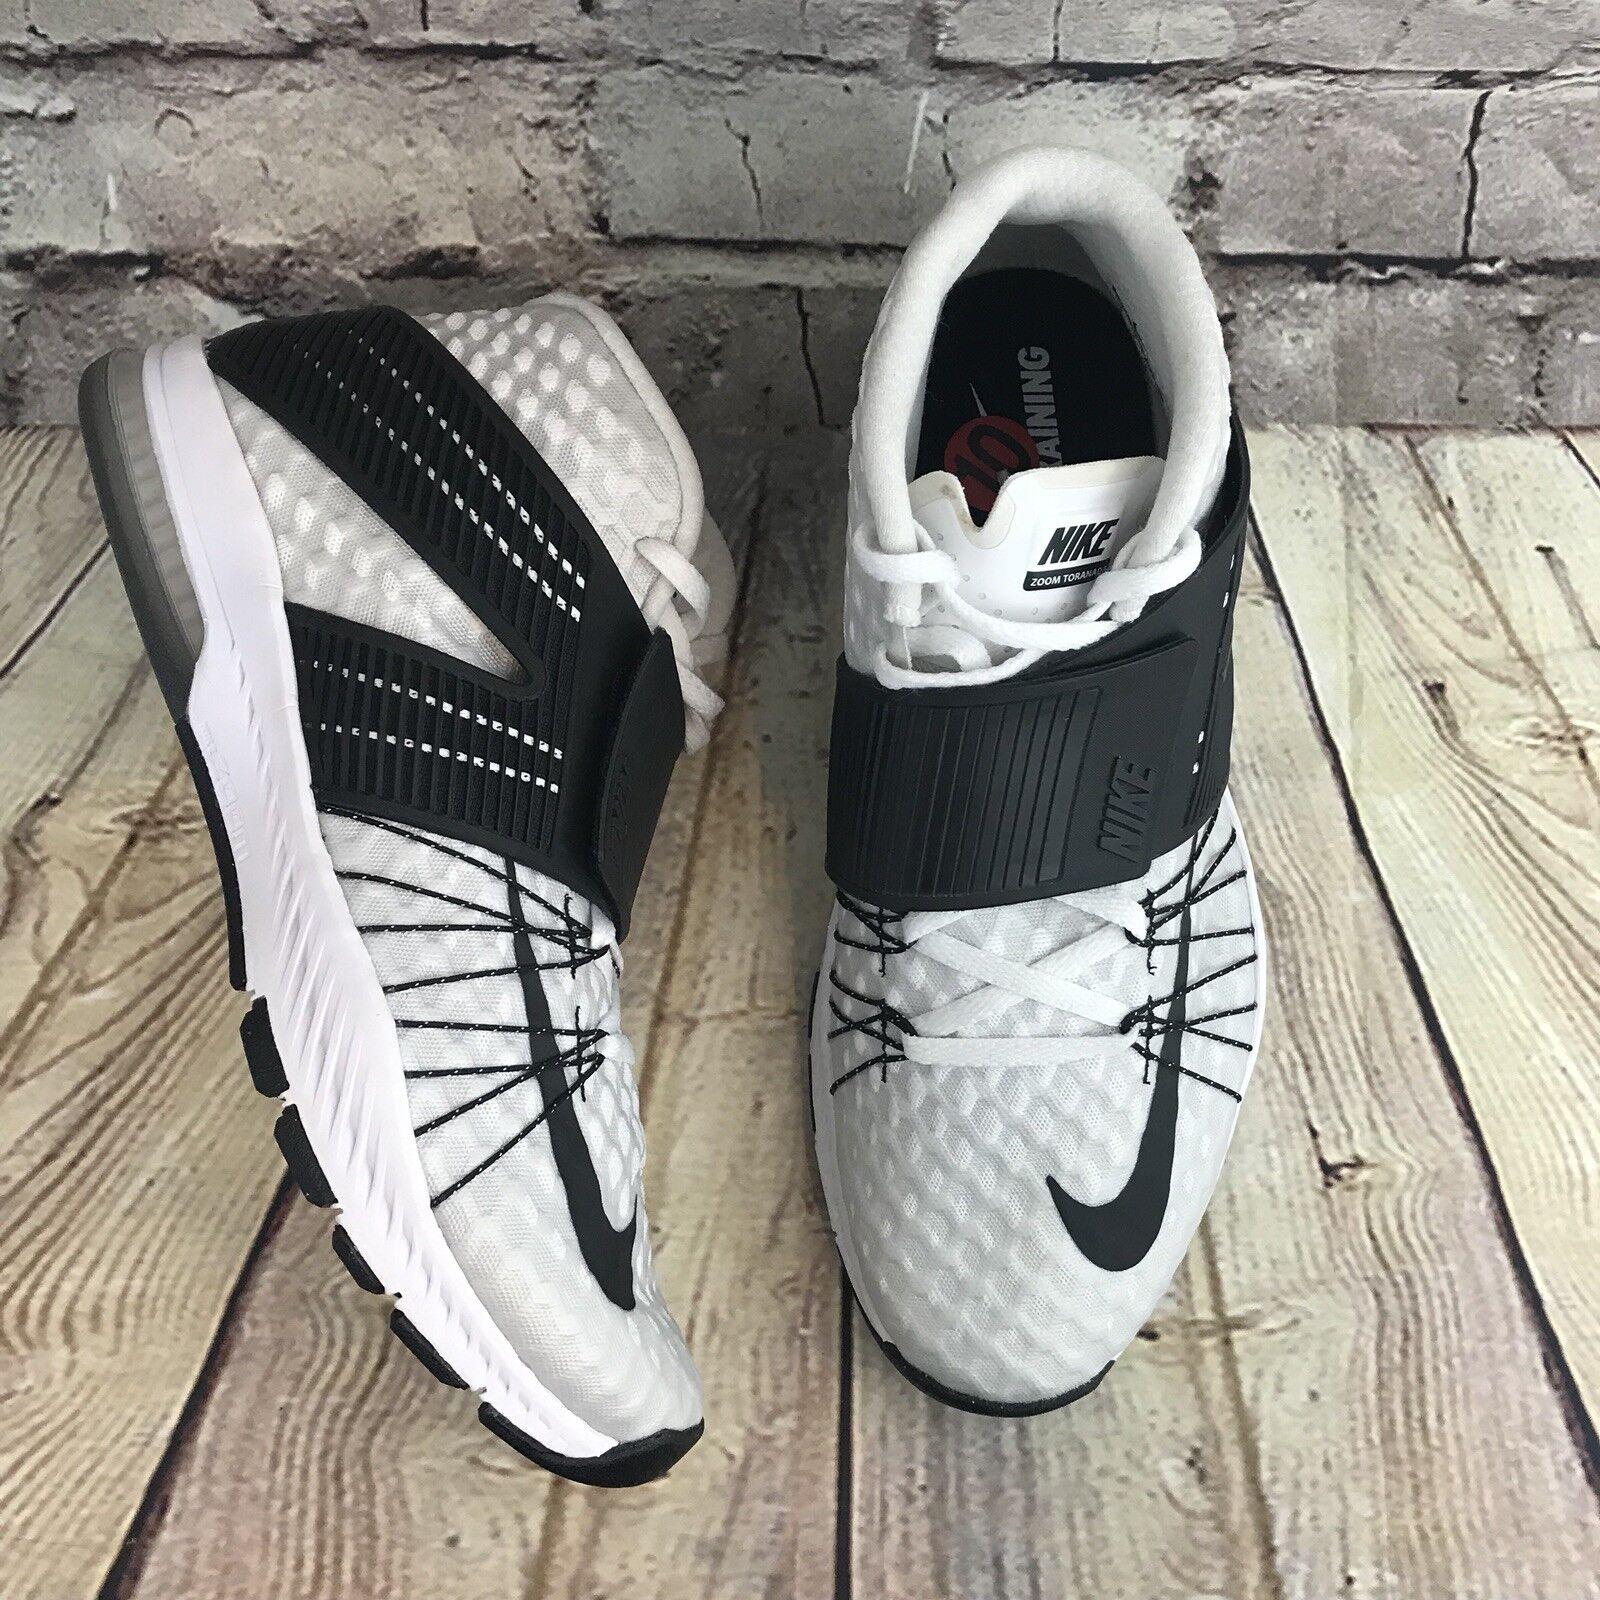 NEW Nike Zoom Train Toranada Men Athletic Sneaker 835657-100 835657-100 835657-100 White/Black Size10 ecfd90